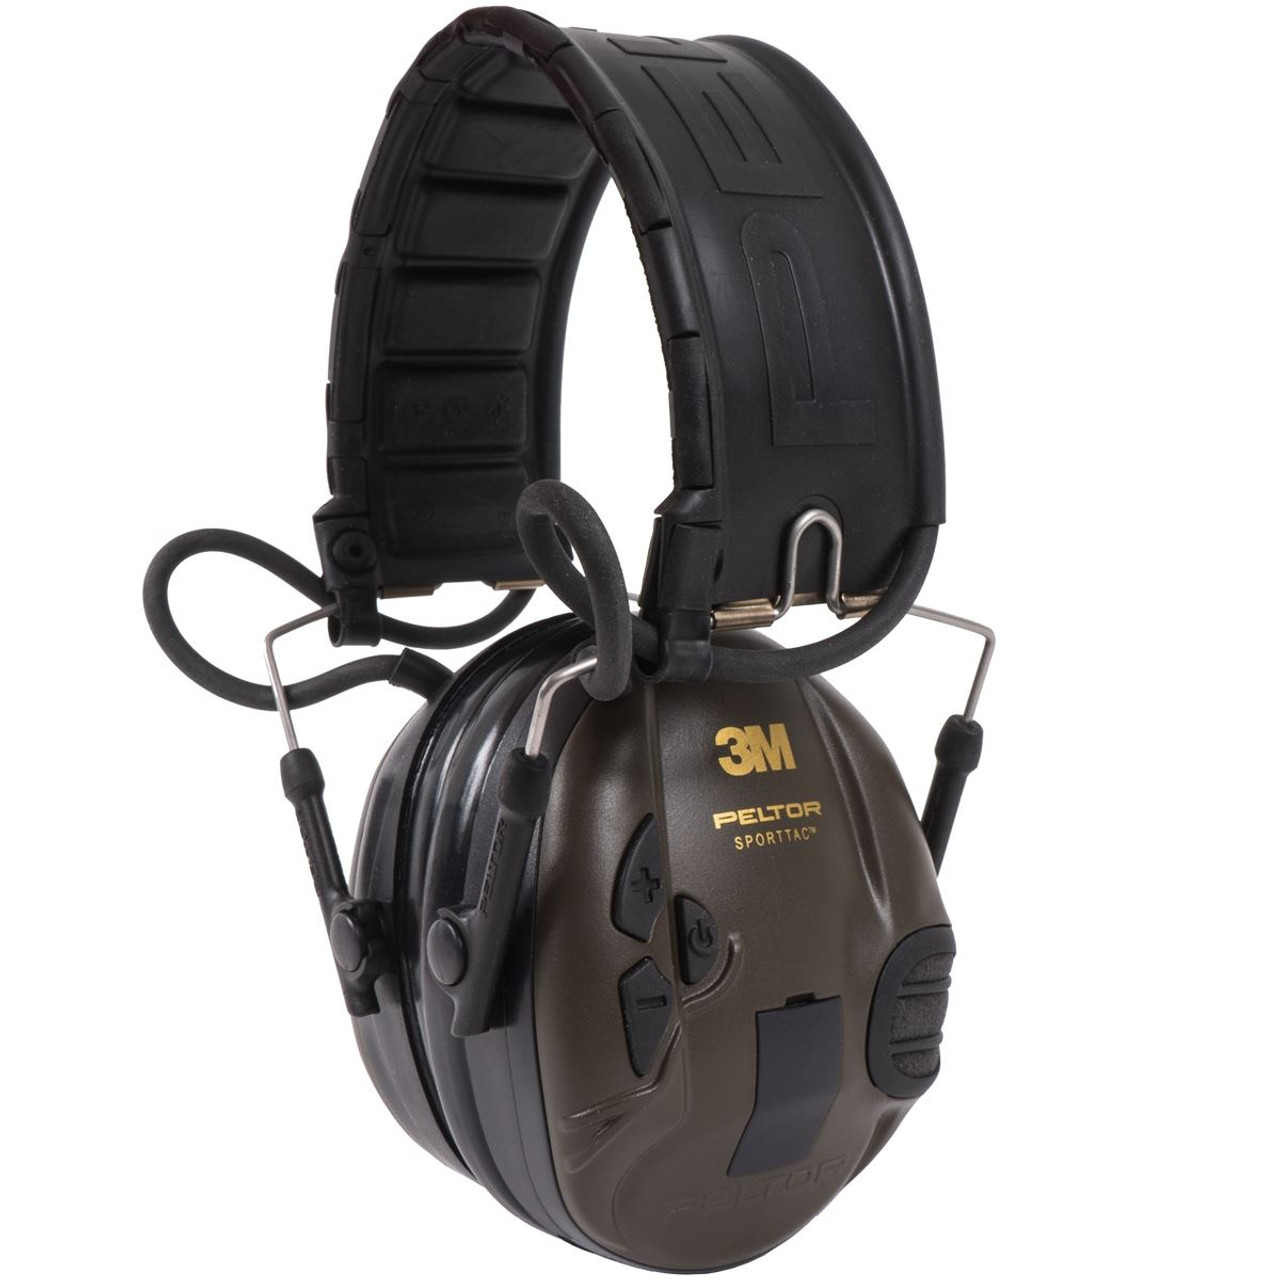 Peltor Ear Defenders SportTac Ear Protection